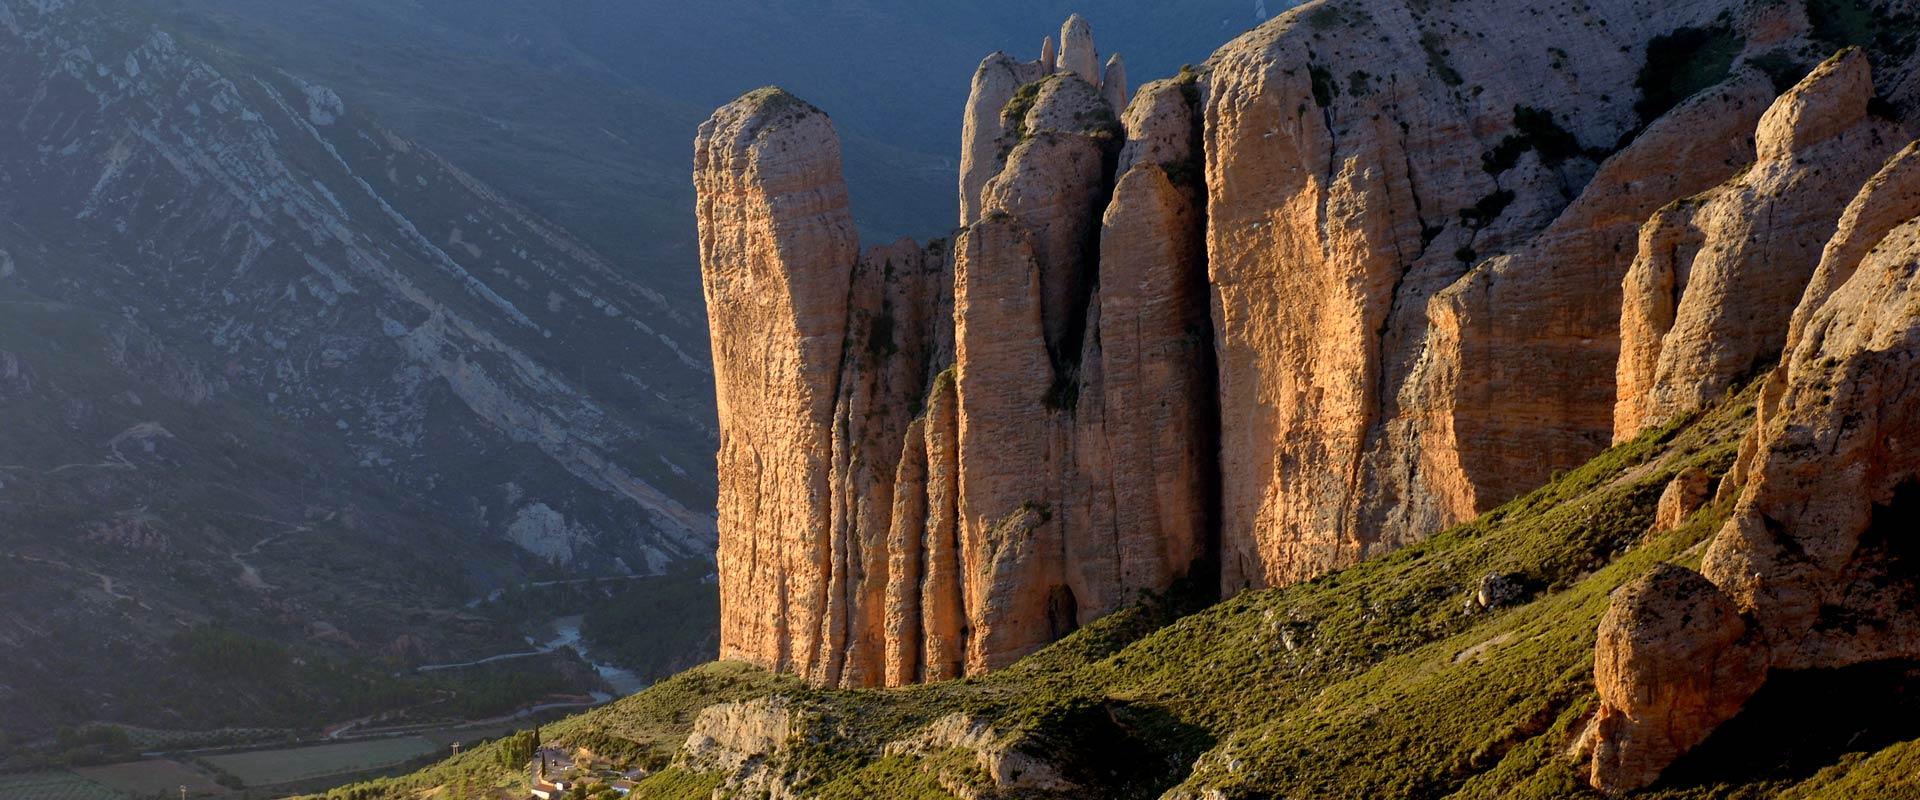 Travesia GR1 trail sendero historico